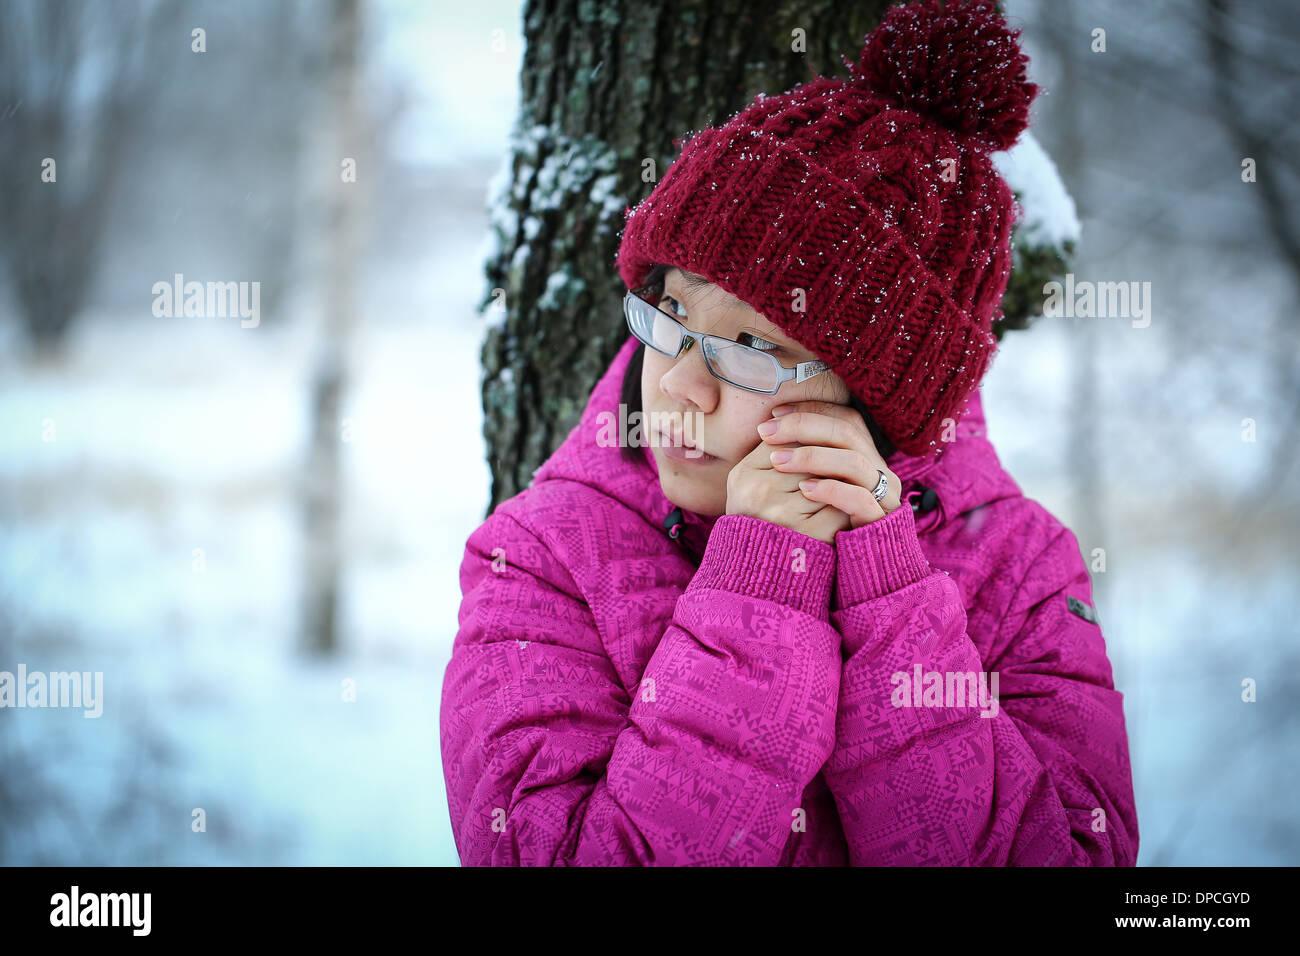 01ef6790e Sad Girl Leaning Against Tree Stock Photos   Sad Girl Leaning ...